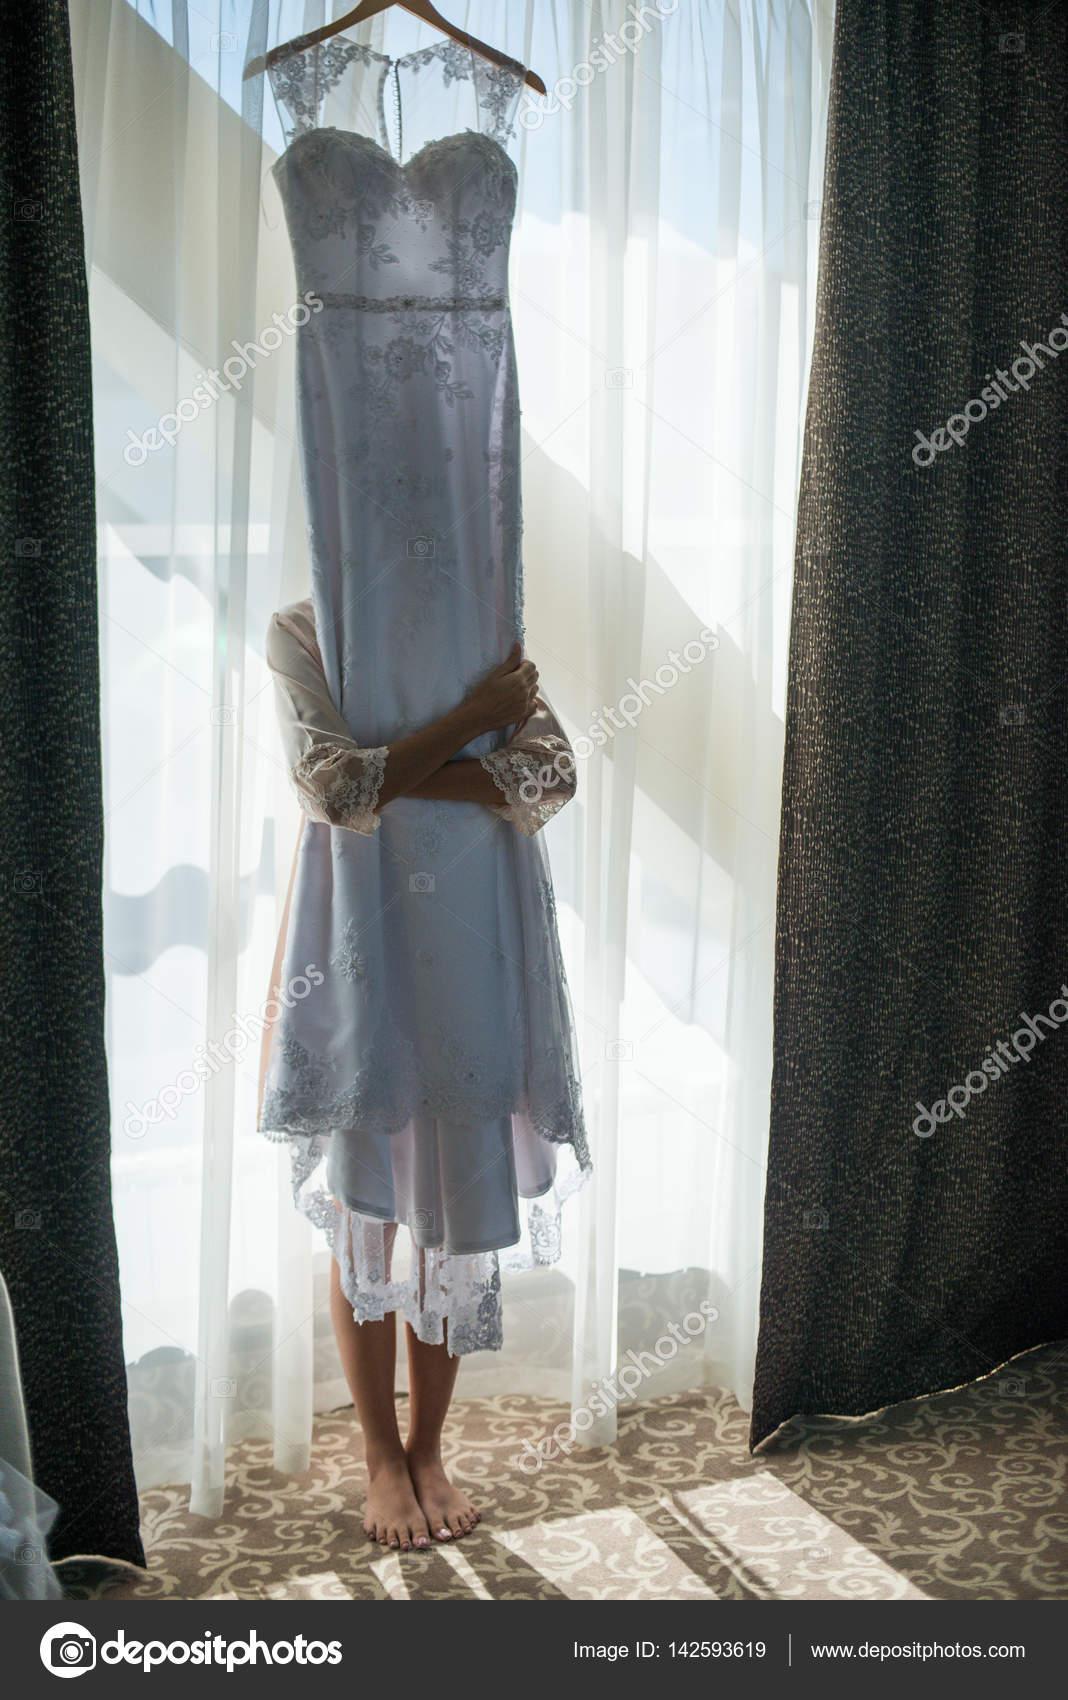 Vestido de novia en la sala blanca — Foto de stock © Alex.S. #142593619